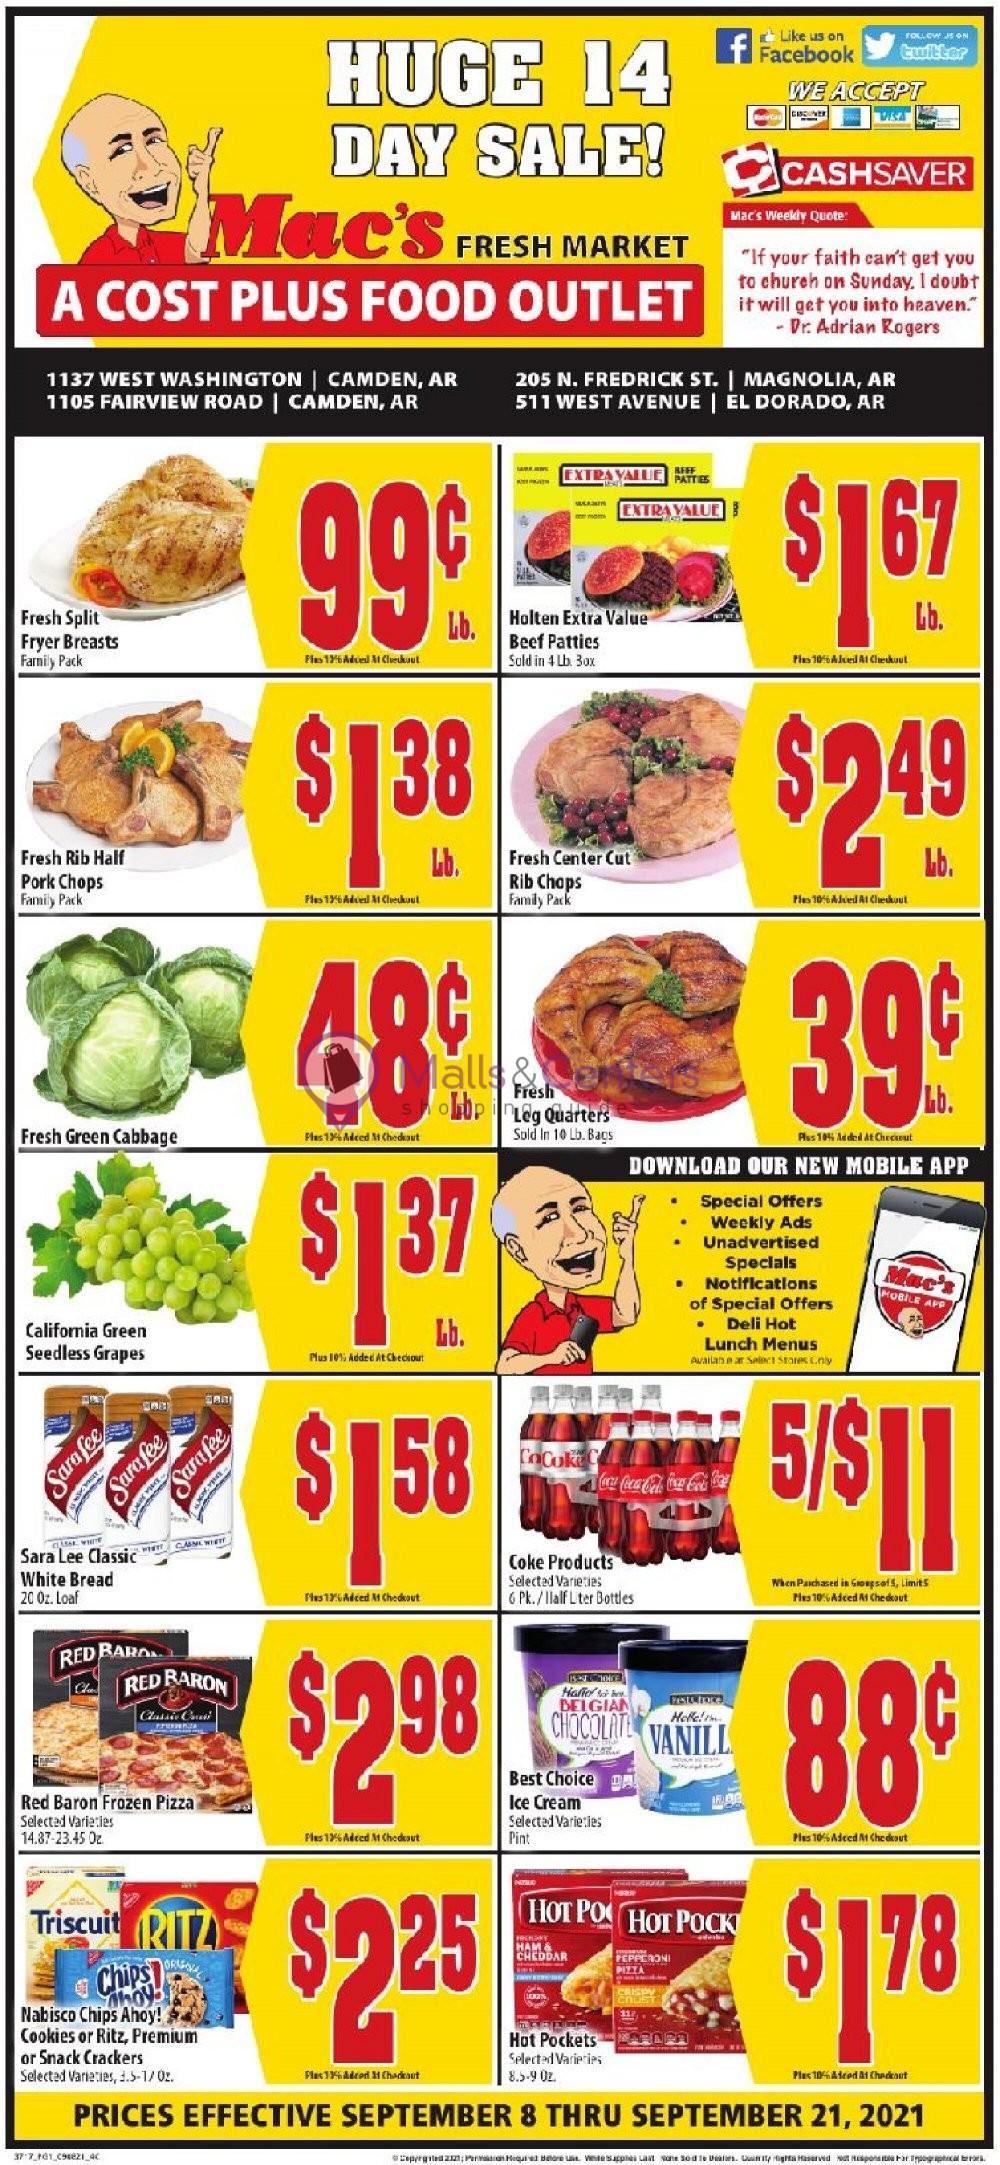 weekly ads Mac's Fresh Market - page 1 - mallscenters.com